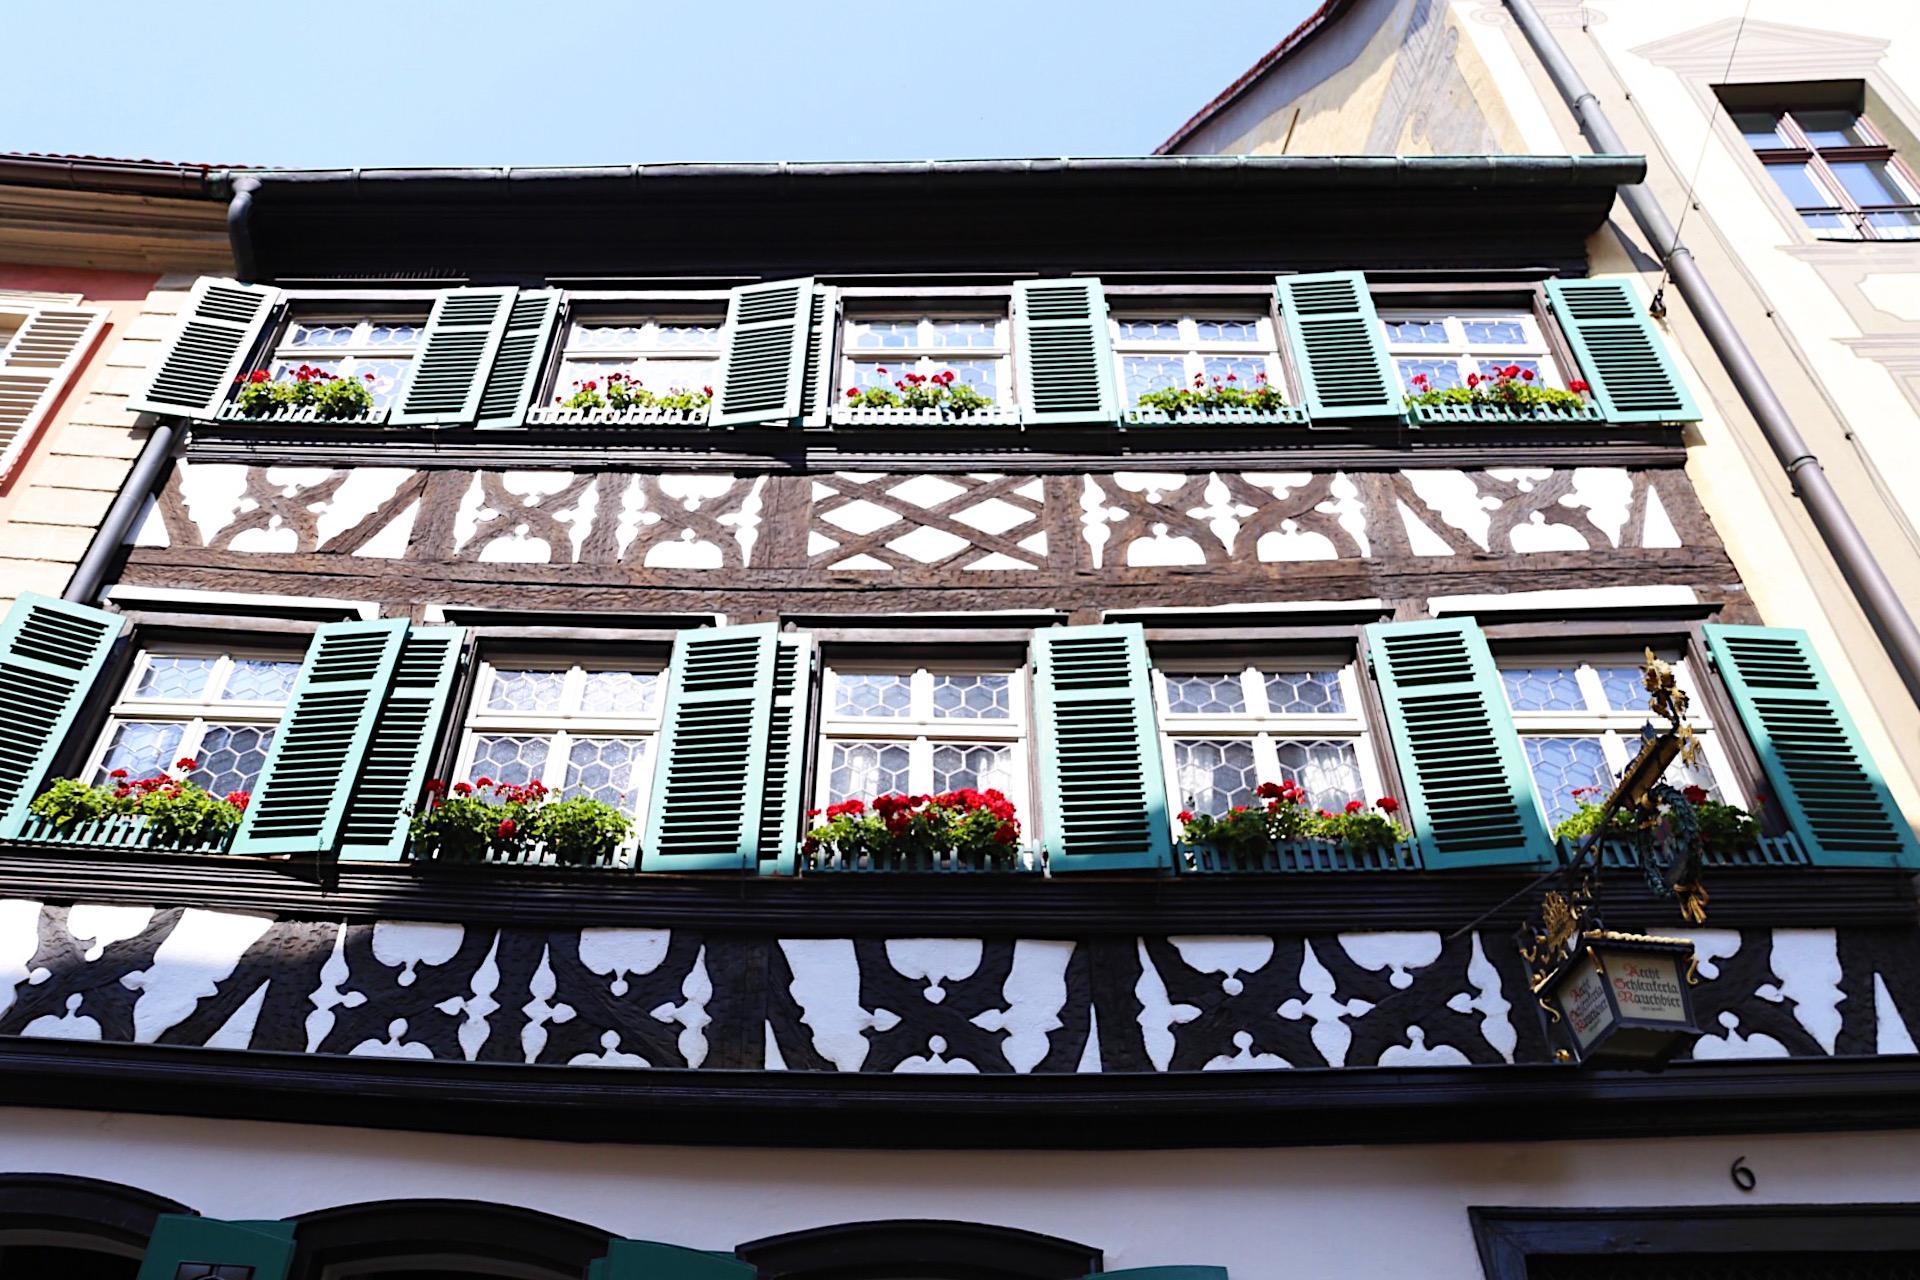 Bamberg Schlenkerla Smoked Beer Brewery